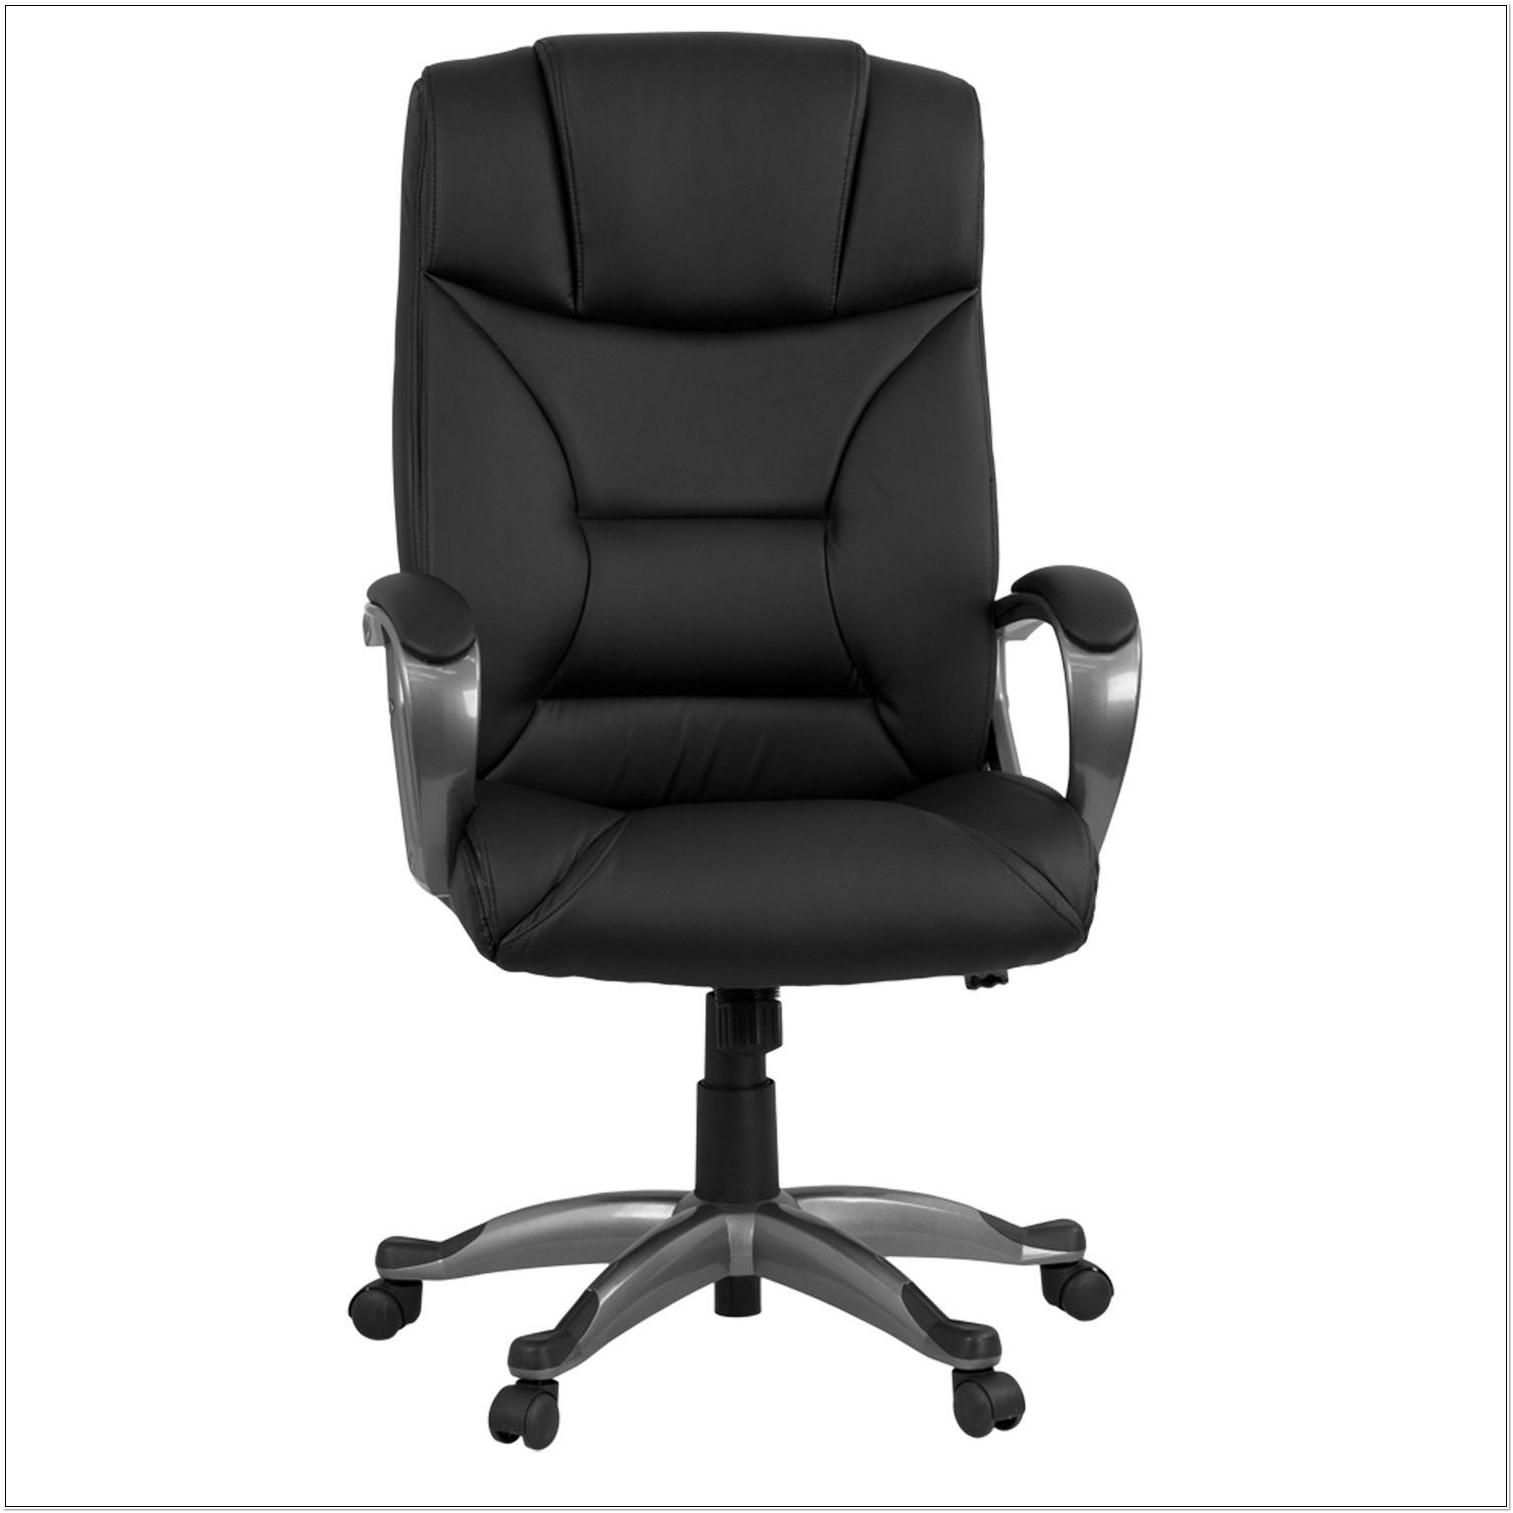 Swinton Avenue Trading Desk Chair